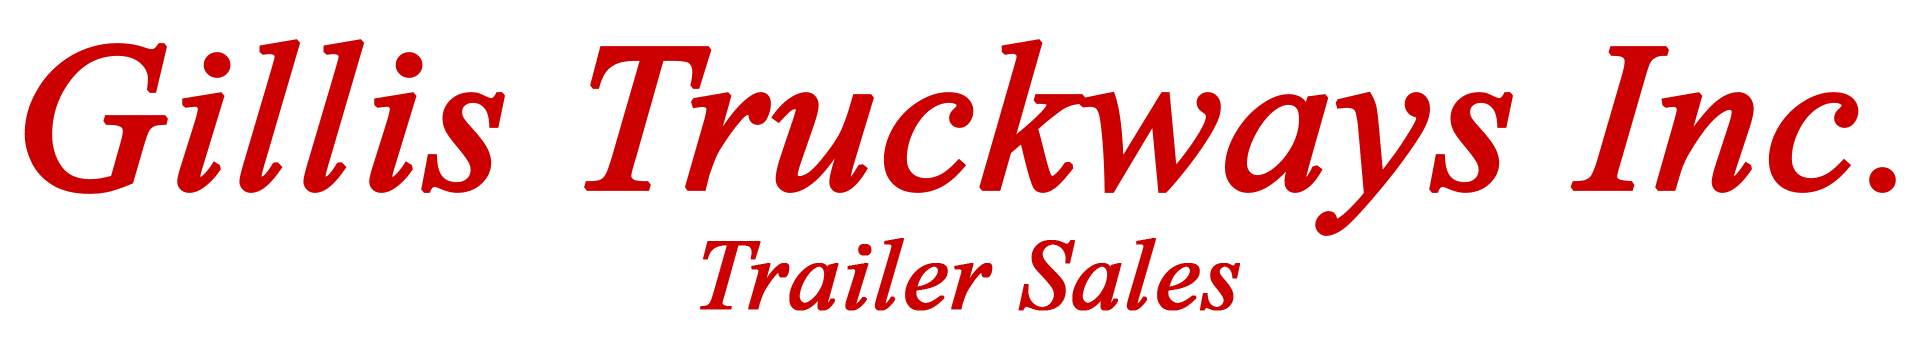 Jc Trailers Gillis Truckways Inc